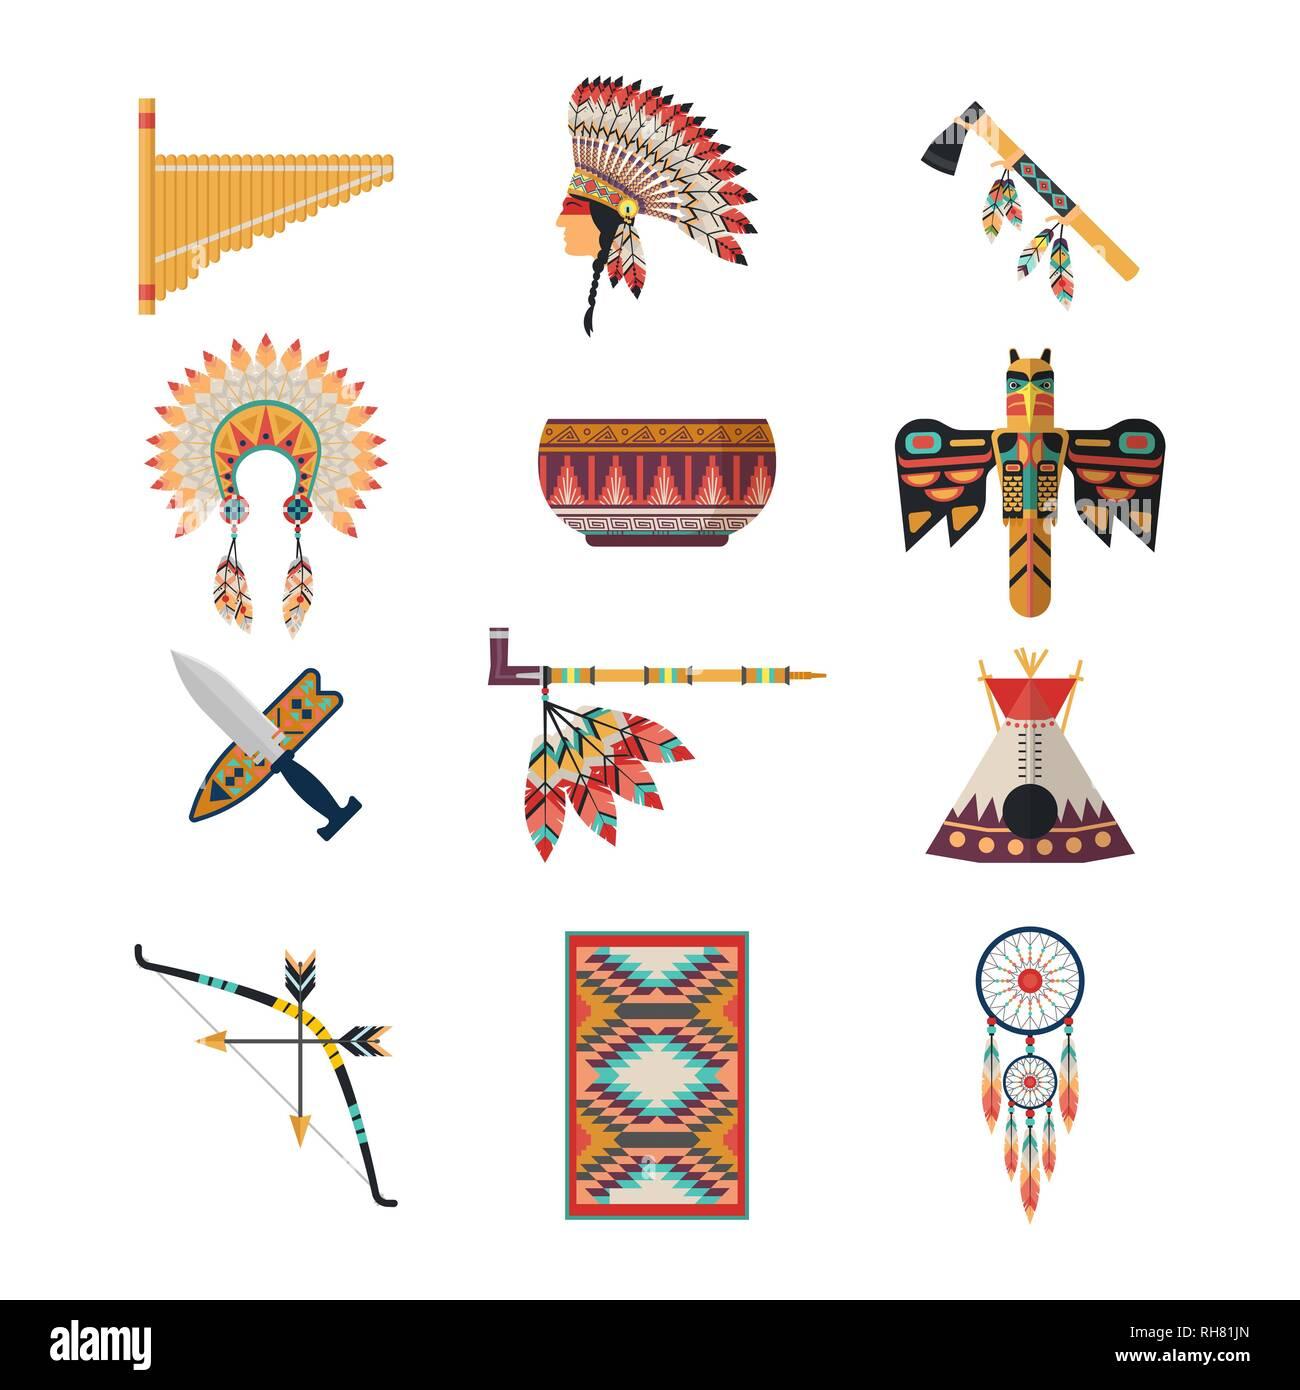 American indian symbols - Stock Image